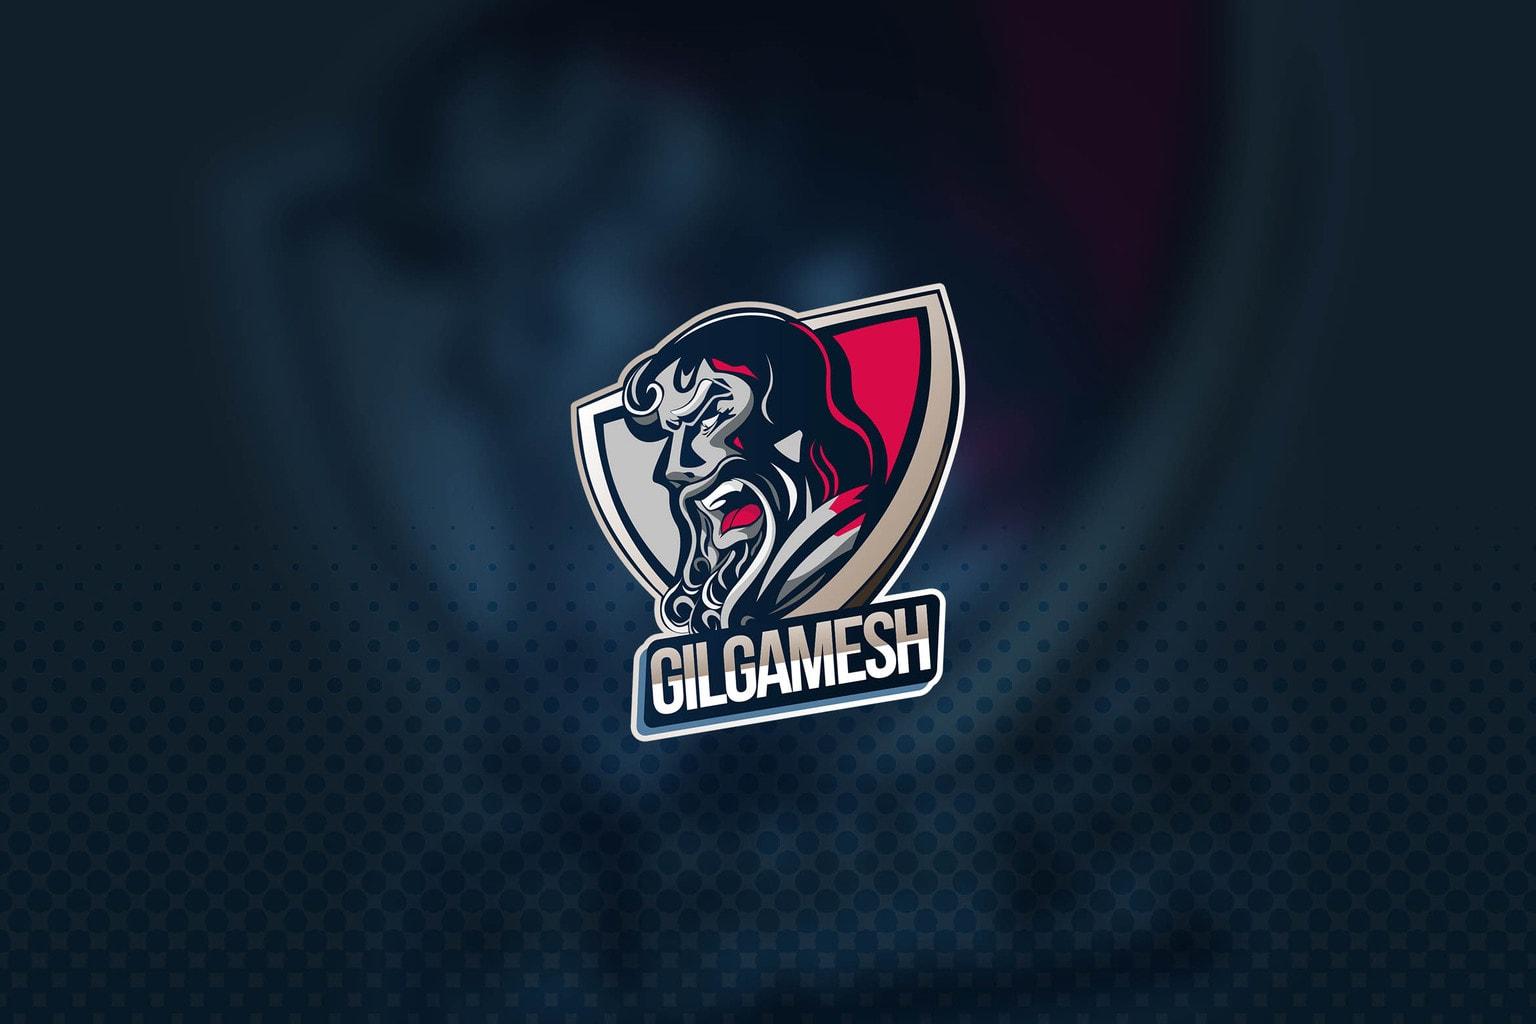 esport logo the king gilgames